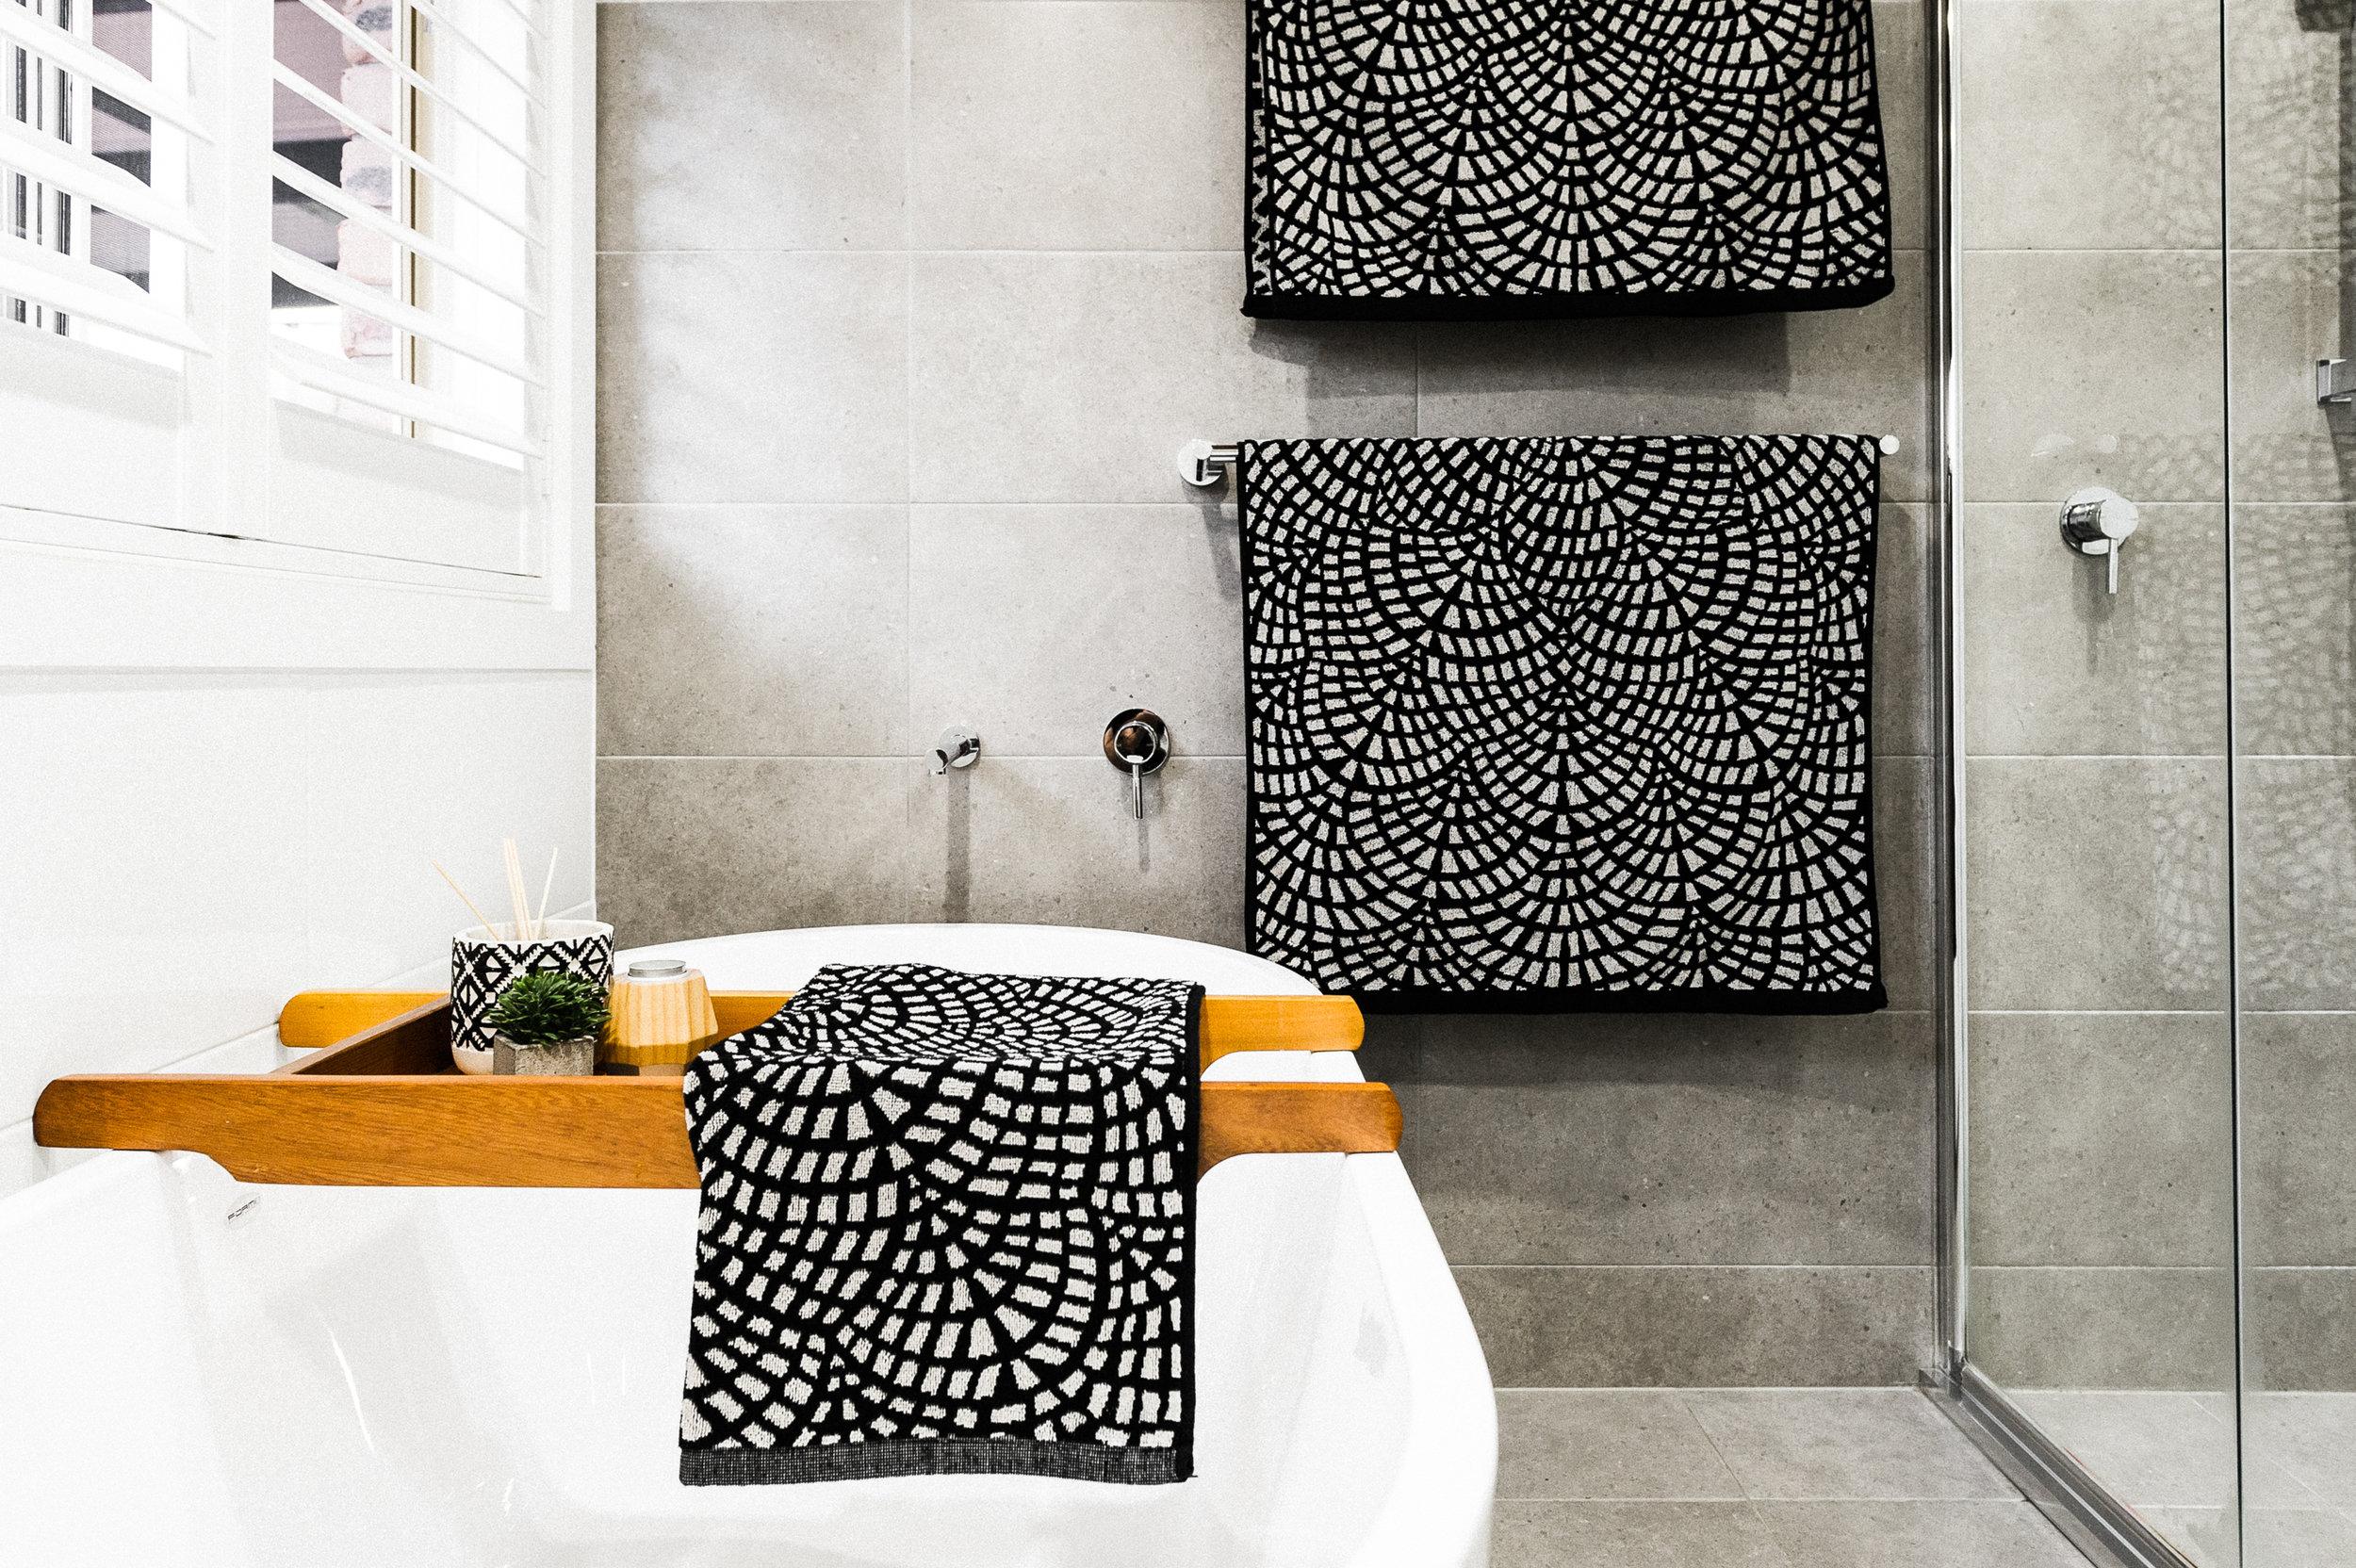 Copy of Kiama Shellharbour Gerringong Berry Wollongong South Coast Illawarra Real Estate Photographer, real estate photography, real estate, photographer, living room photography, photographer, bathroom